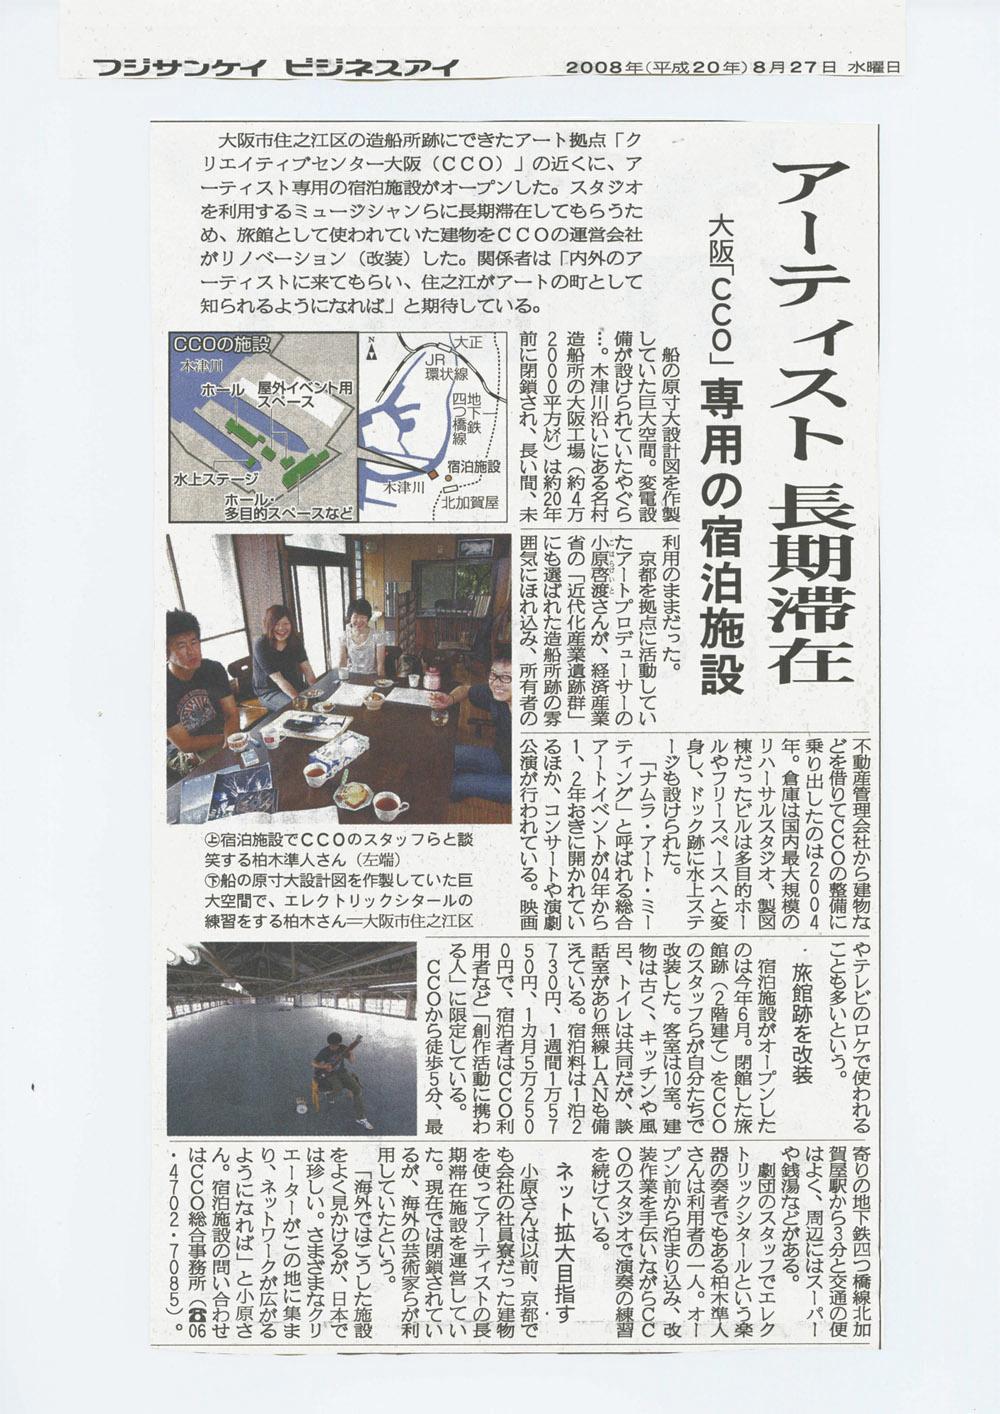 20080914-20080827_hujisankeibijinesuai.jpg